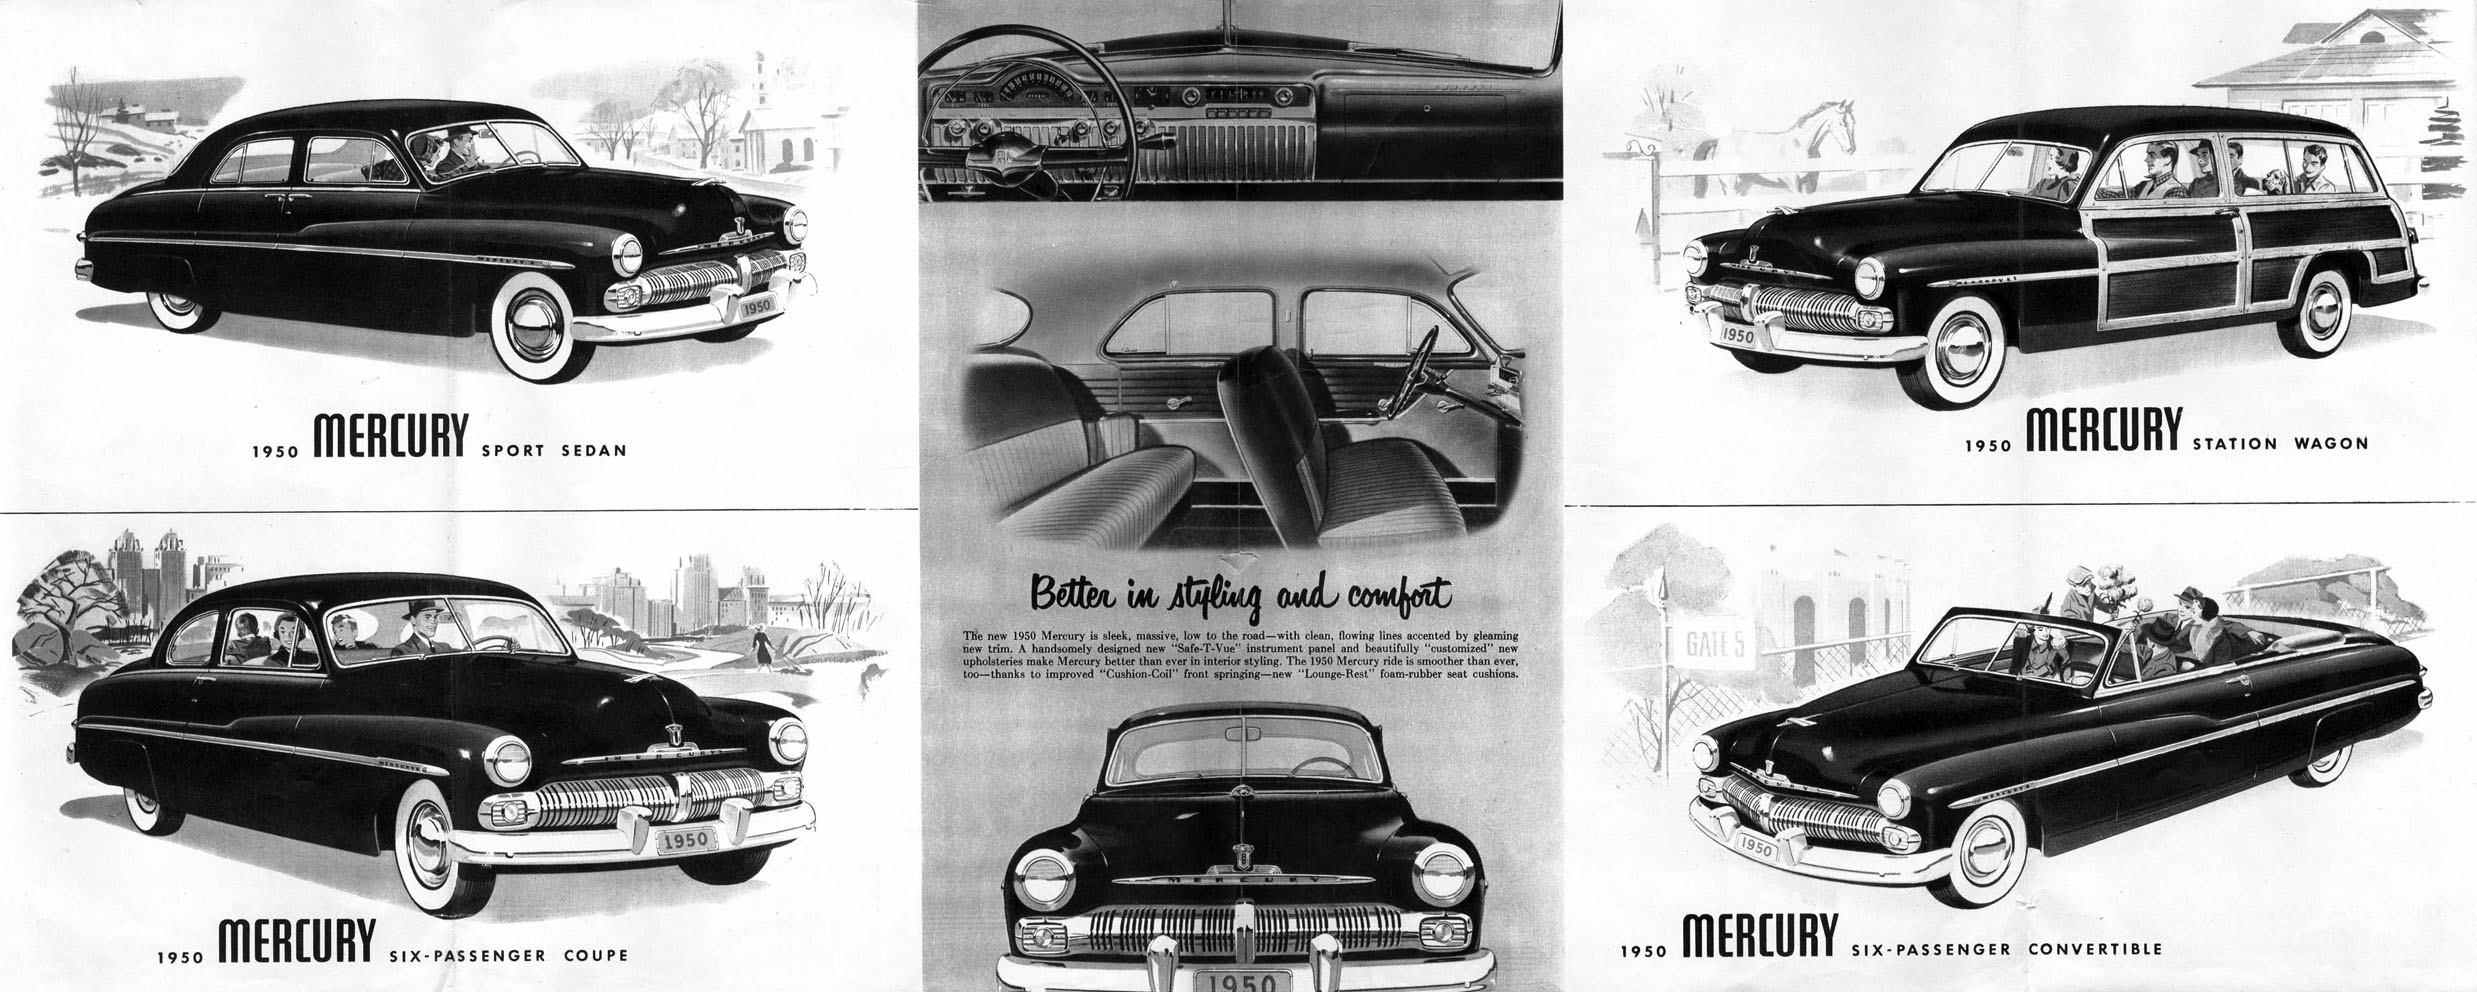 TunelRam_Mercury_1950 B&W.jpg